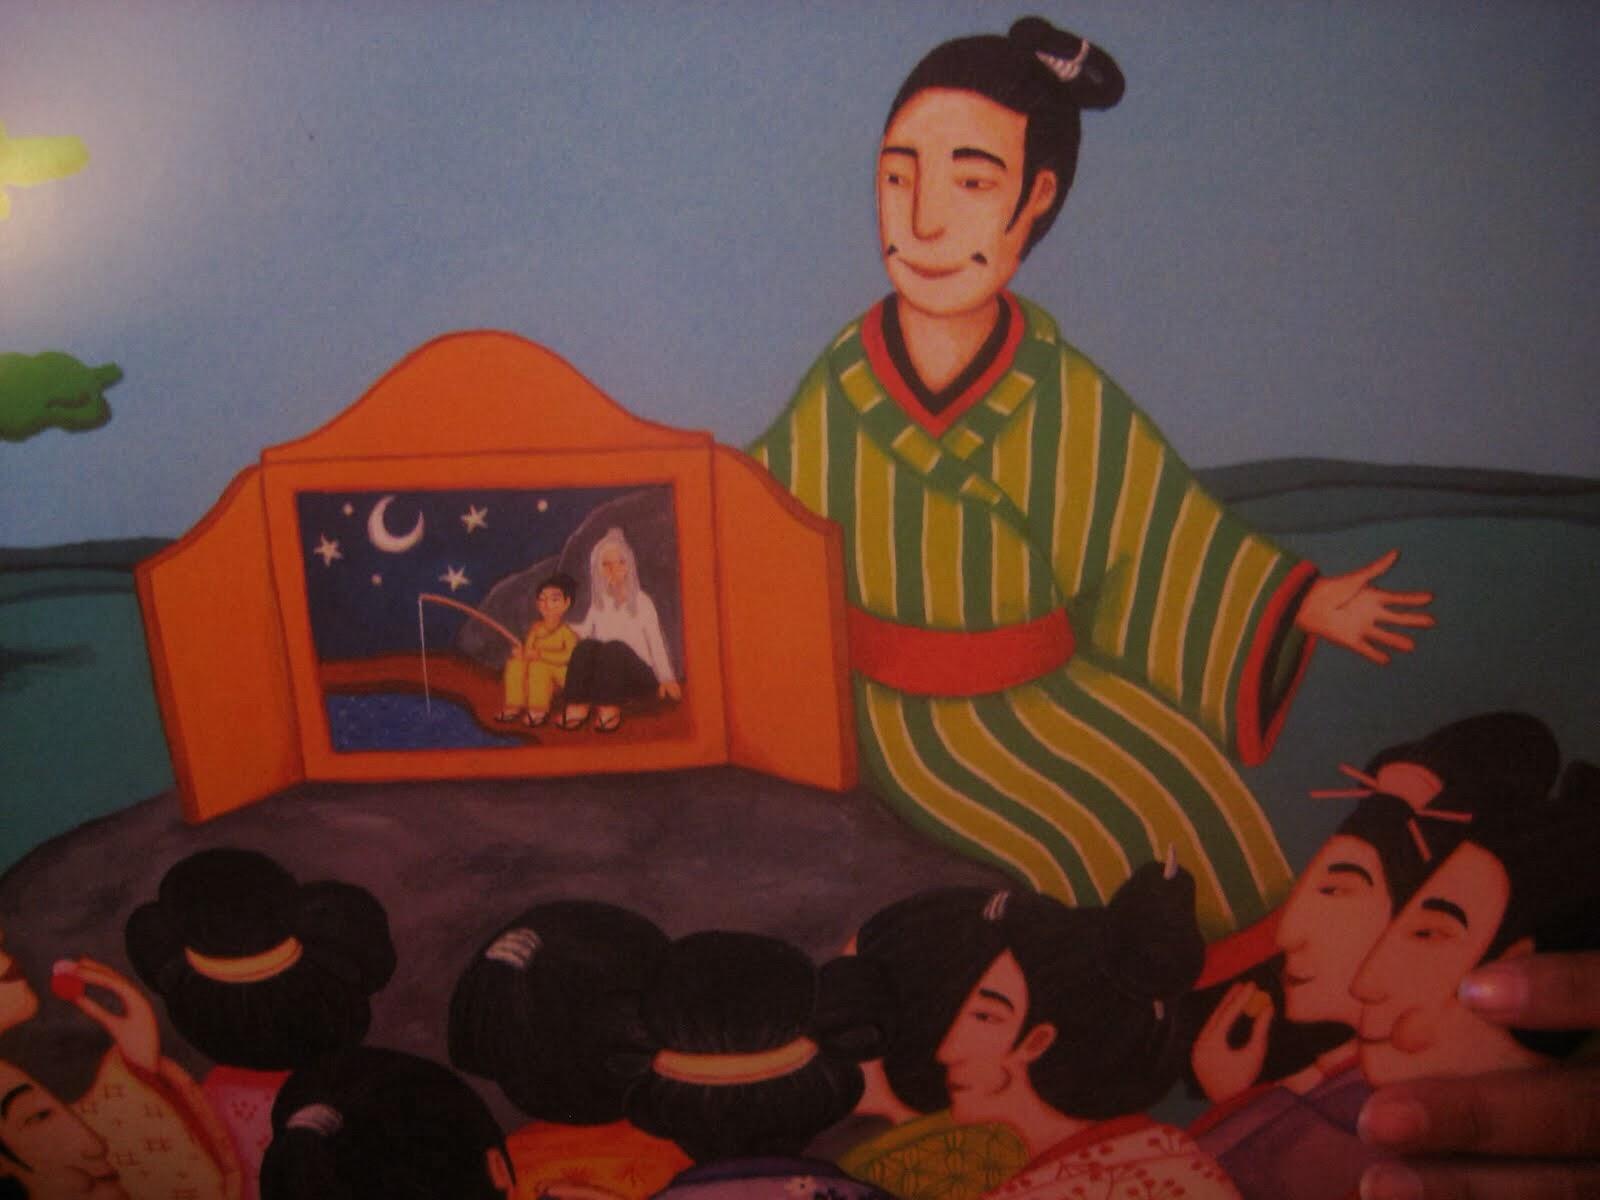 kamishibai-literatura-cuentos-niños-sieteleguas-dideco-teatro-japonés